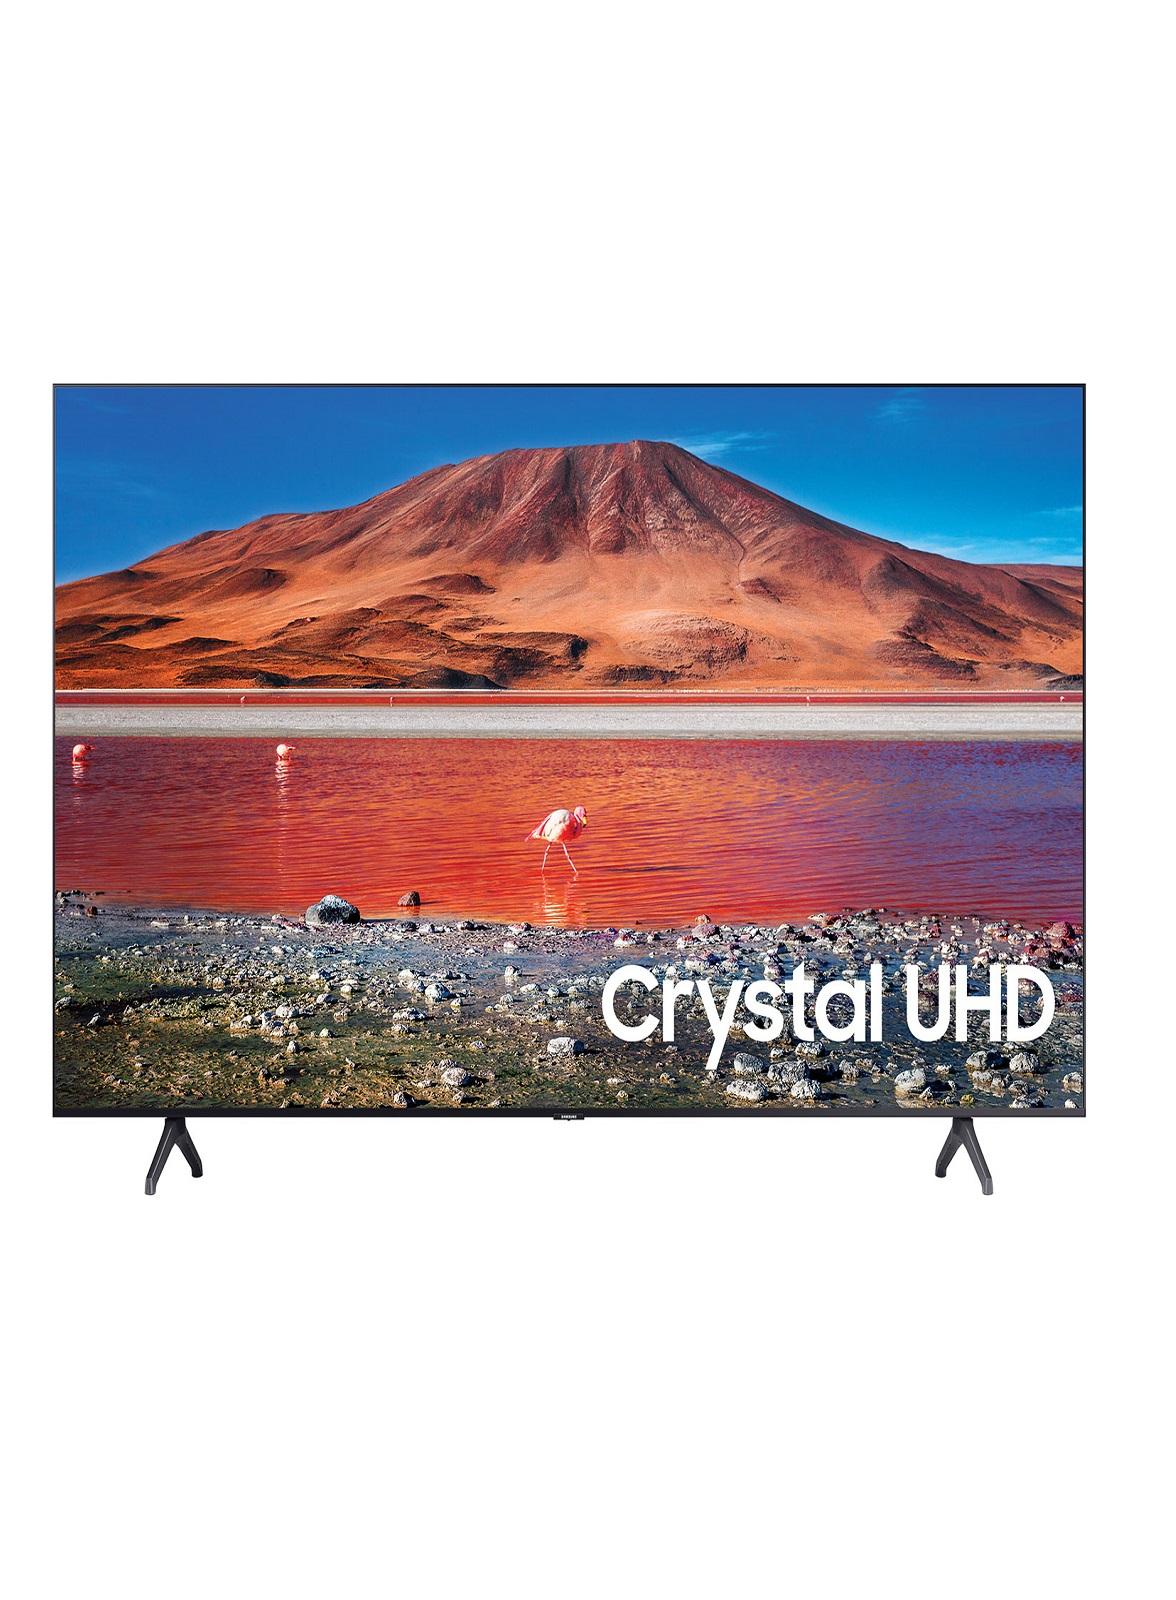 Samsung TU7000 Crystal UHD 4K Smart TV 55 Inch شاشة تلفاز